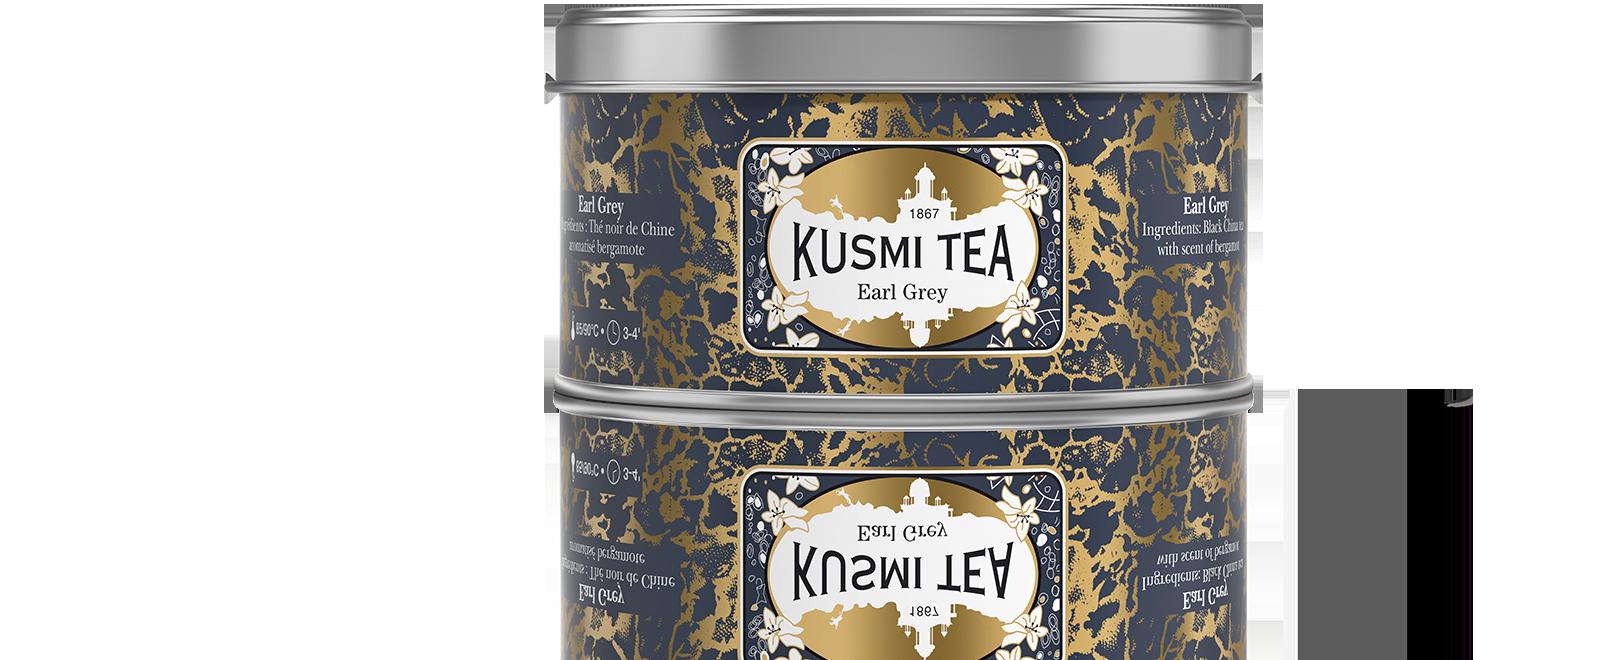 Earl Grey -en vrac Kusmi Tea